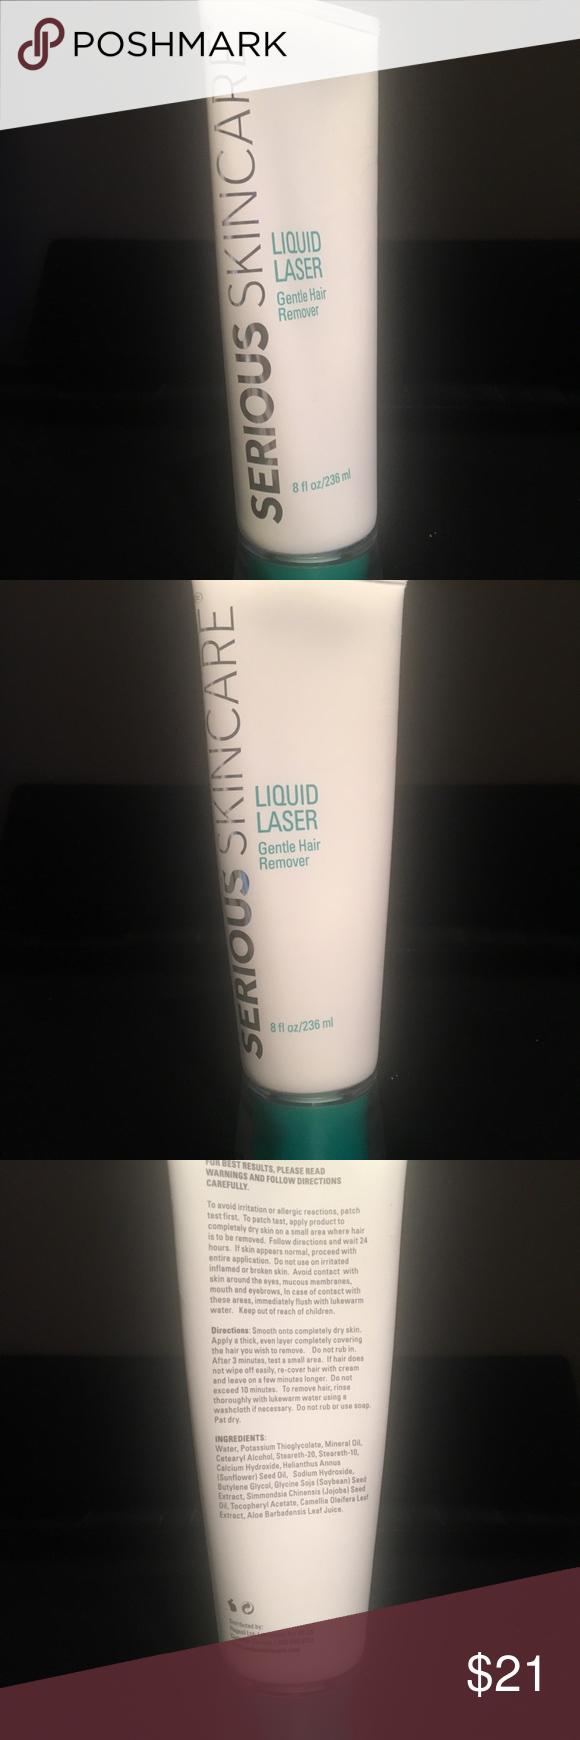 Serious Skin Care Liquid Laser Hair Remover 8 Oz Serious Skin Care Laser Hair Hair Removal